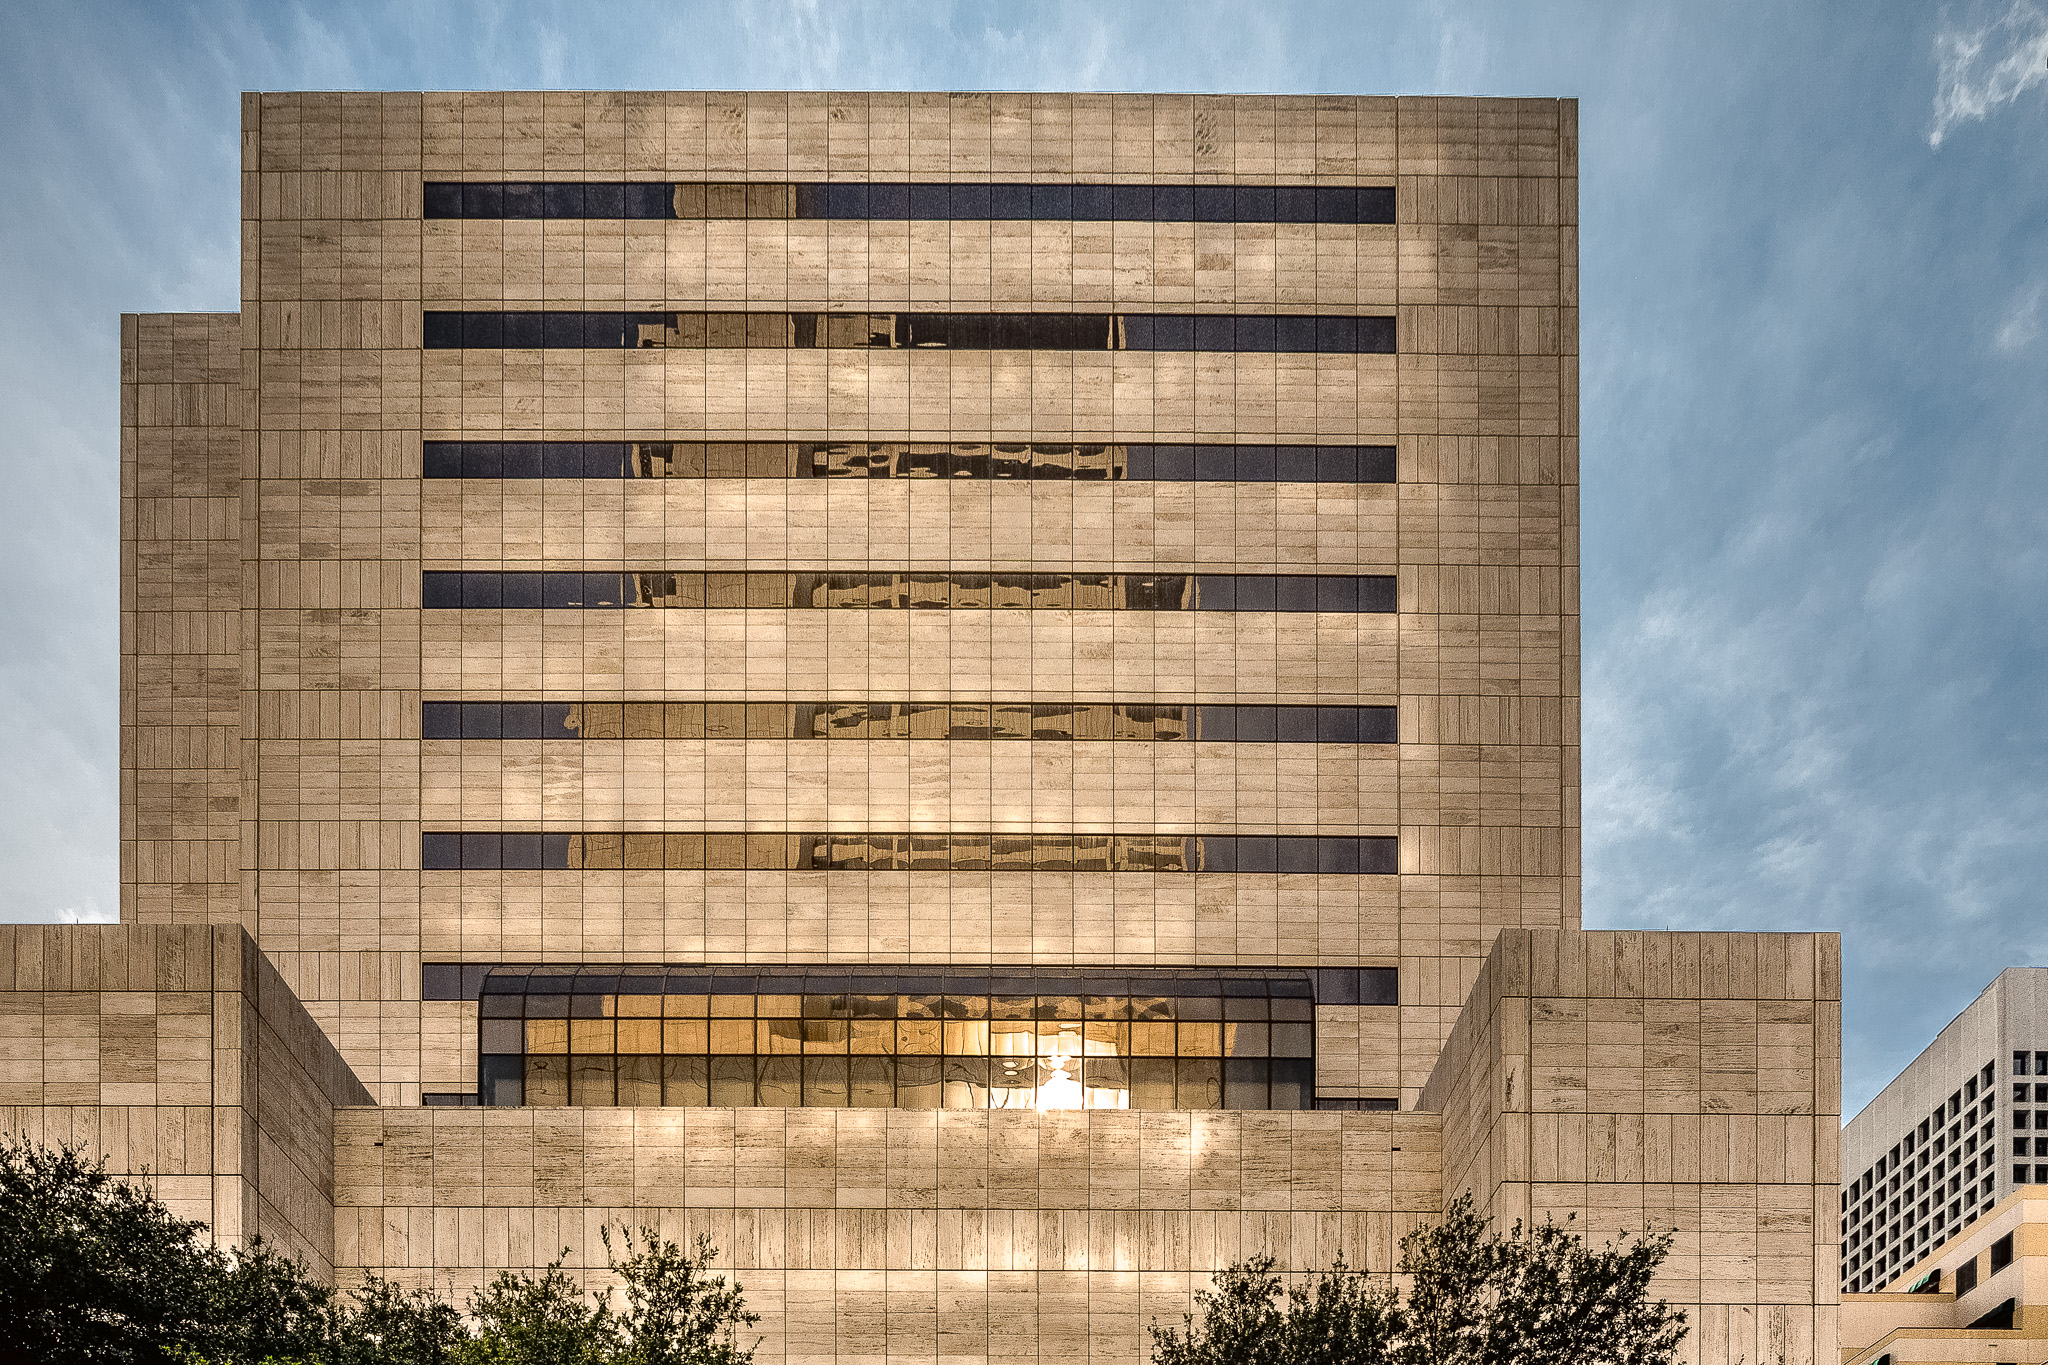 Street Photos-2014-Dallas-6.jpg